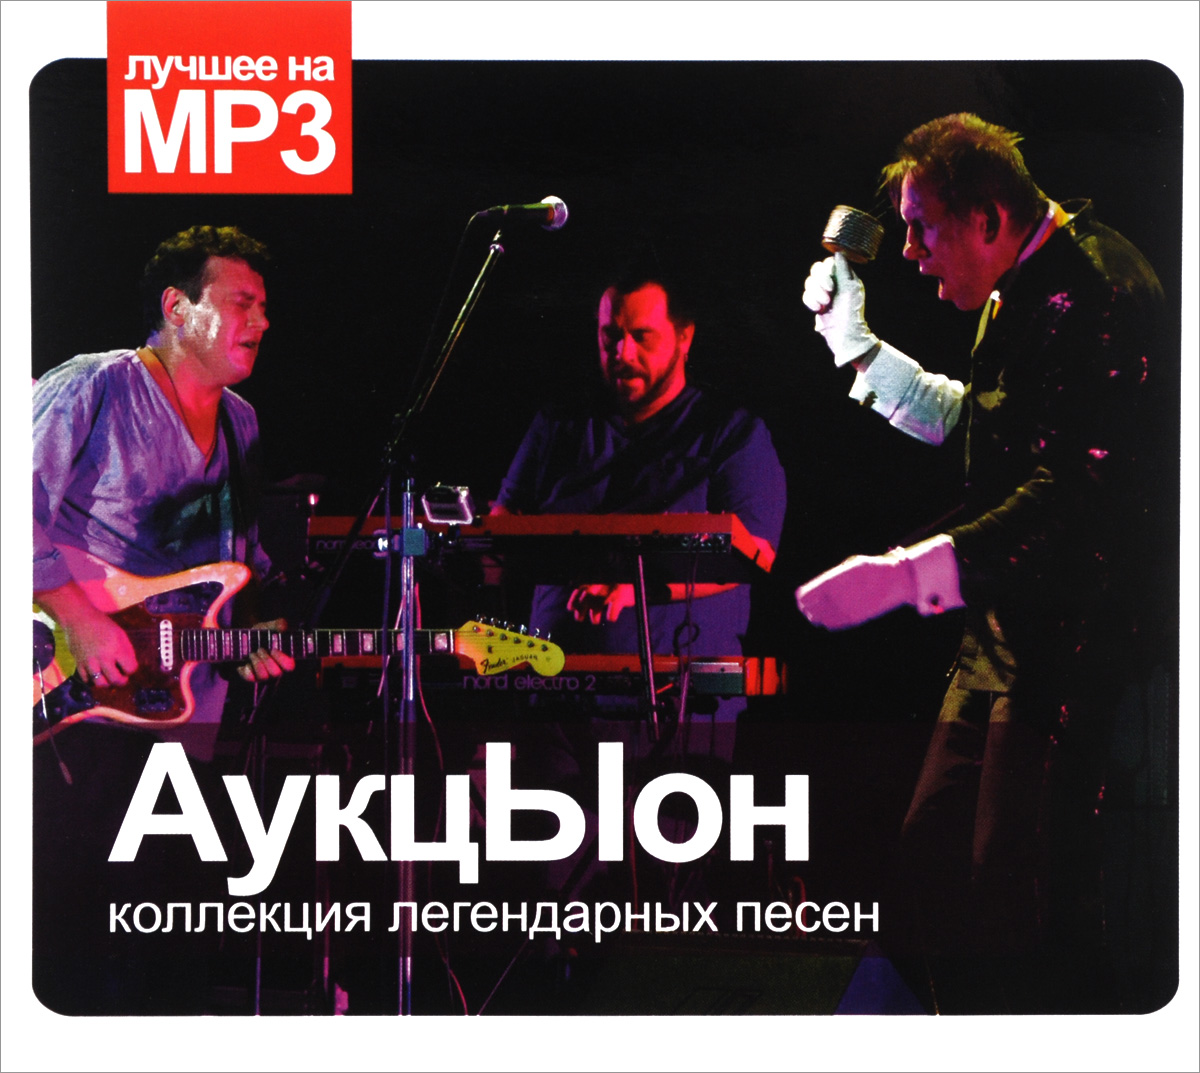 Zakazat.ru АукцЫон. Коллекция легендарных песен (mp3)